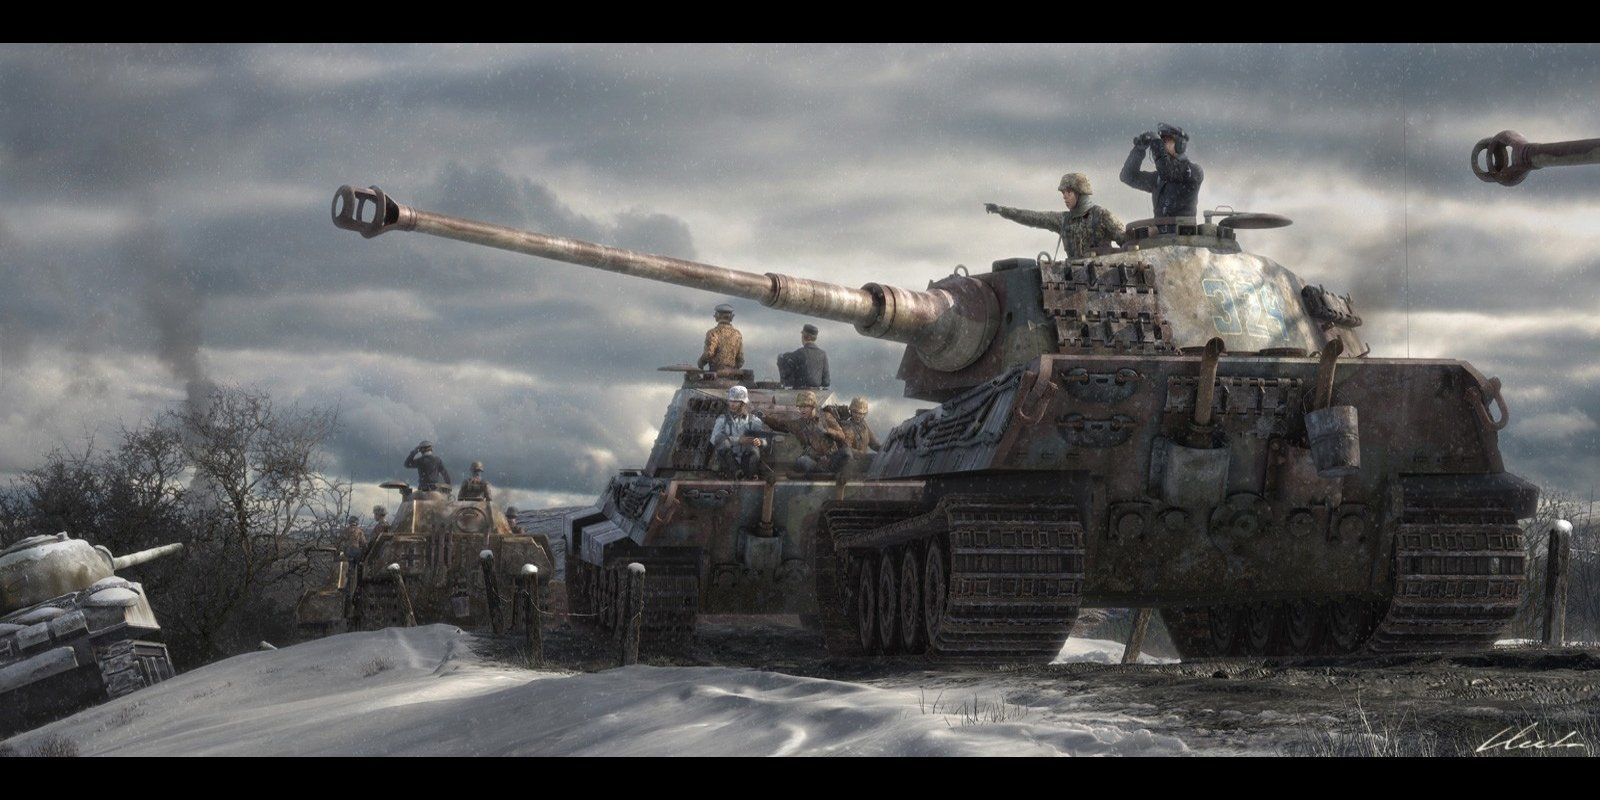 German WW2 Tank Wallpapers - Top Free